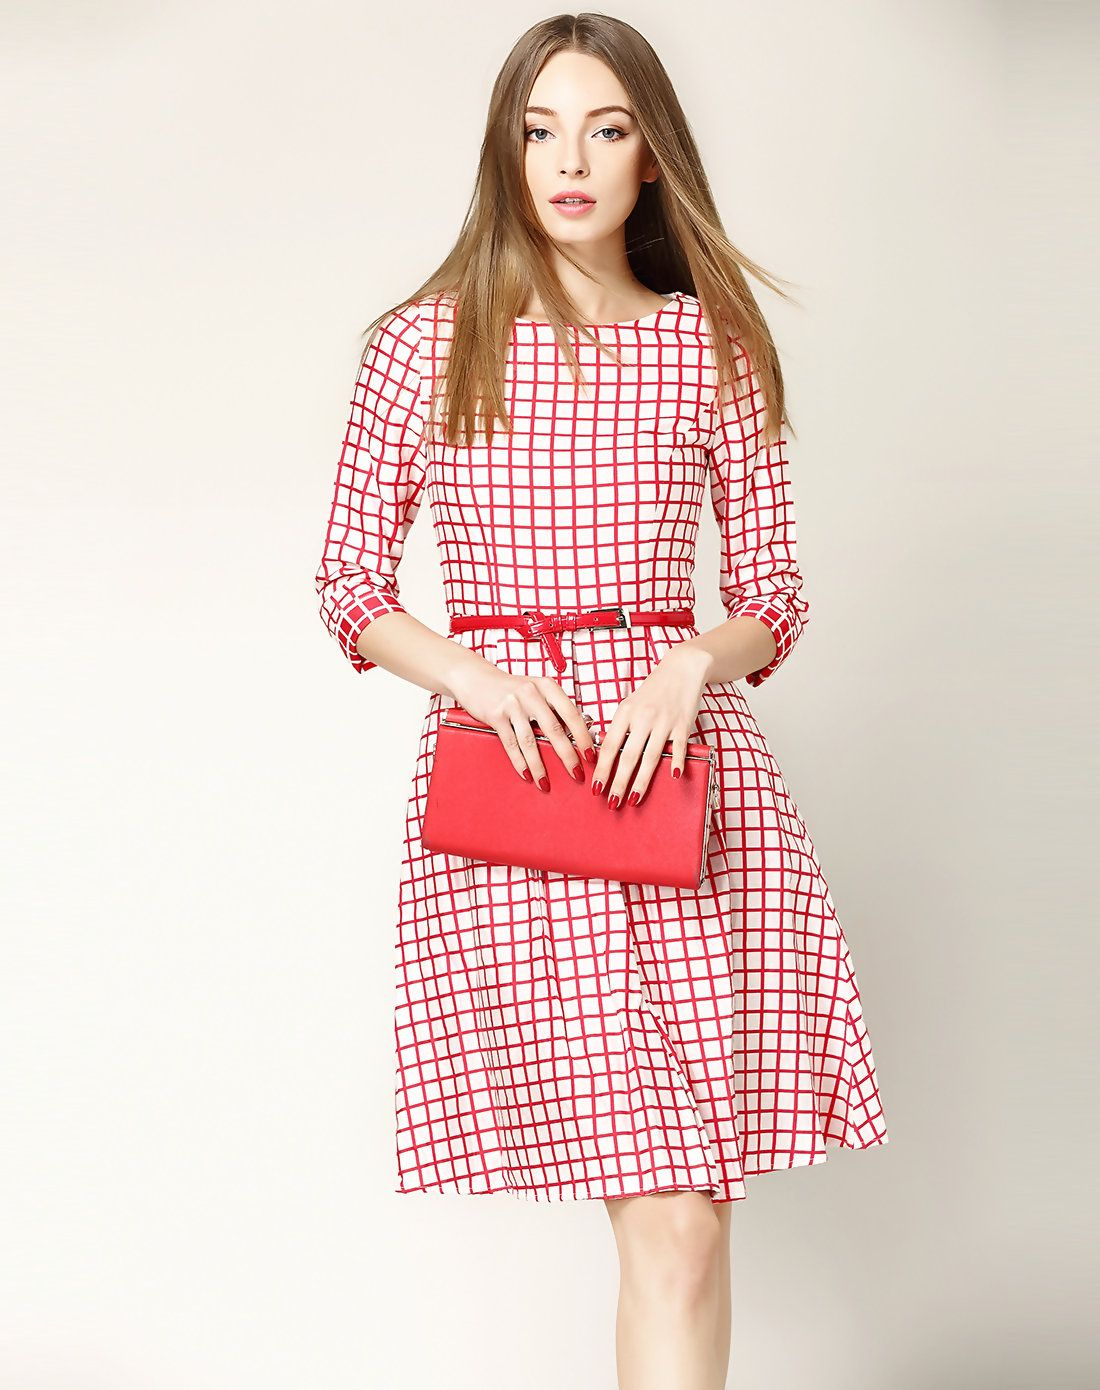 Adorewe vipme aline dresses nexiia red sleeve plaid a line